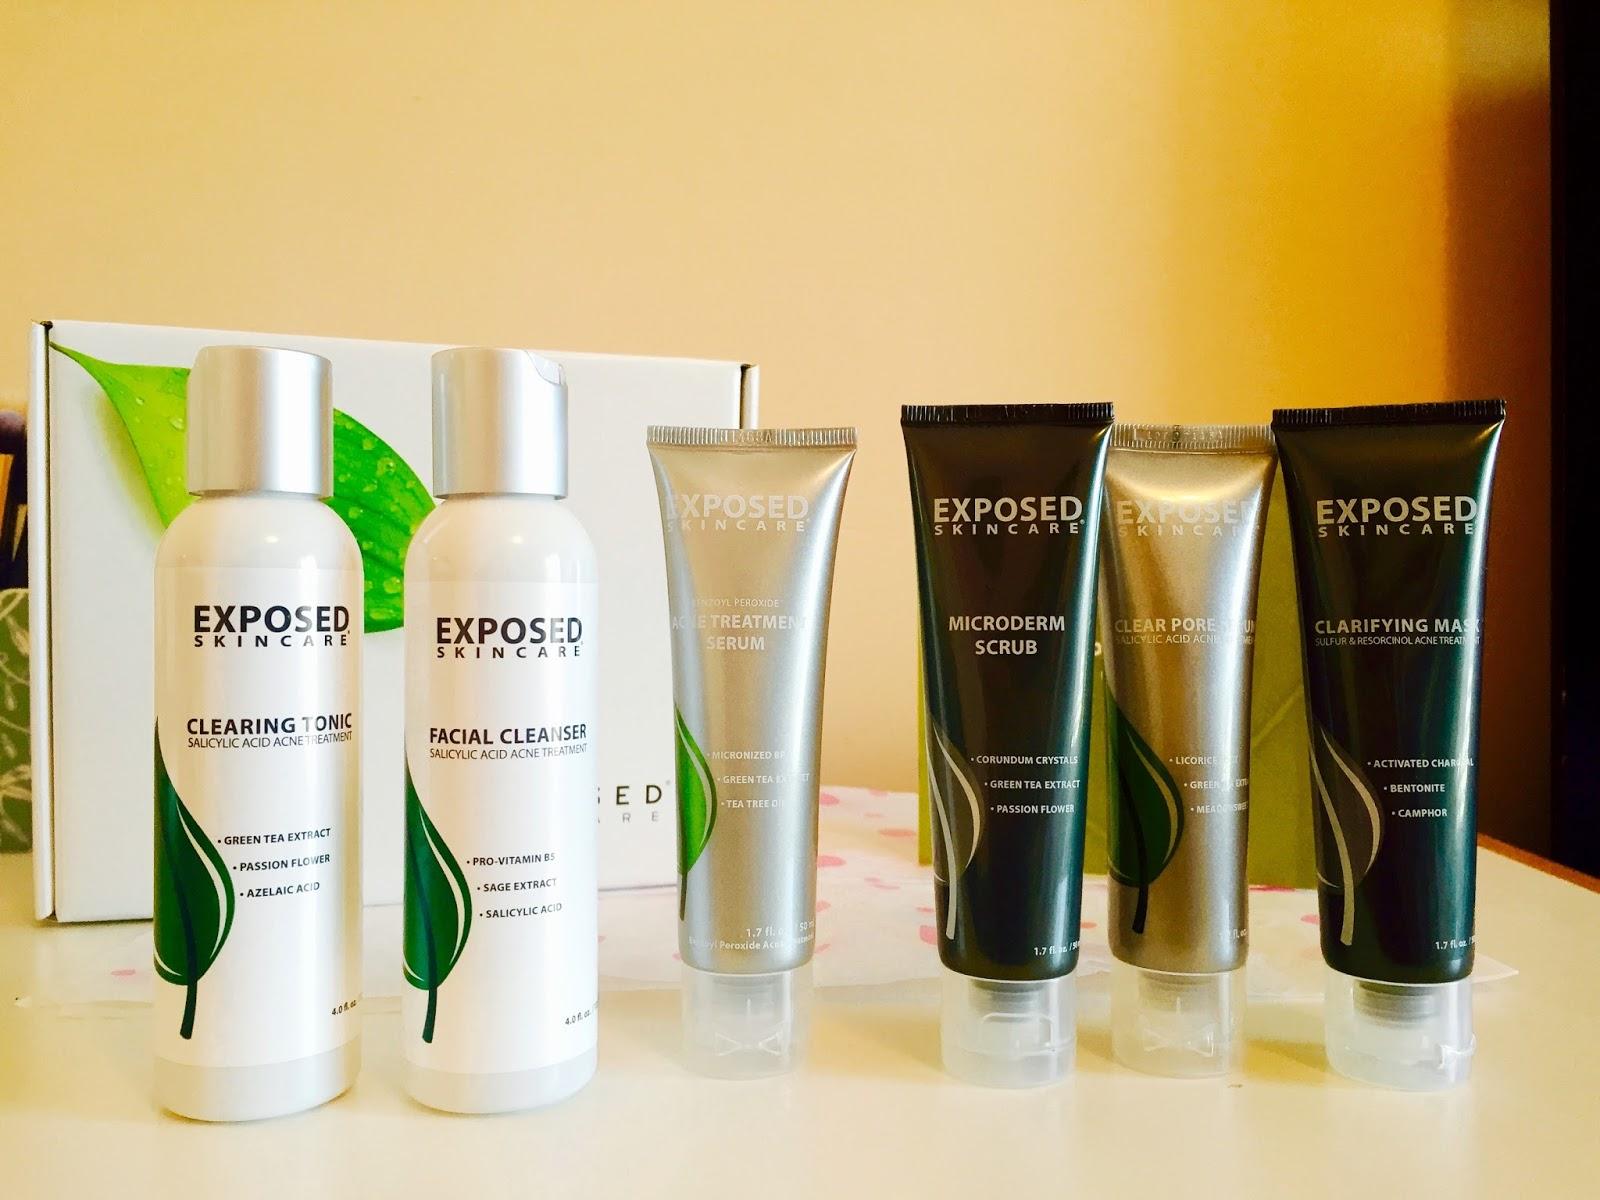 exposed skincare, acne treatment, exposed skincare review, acne treatment review, products, product reviews, skin care treatment,